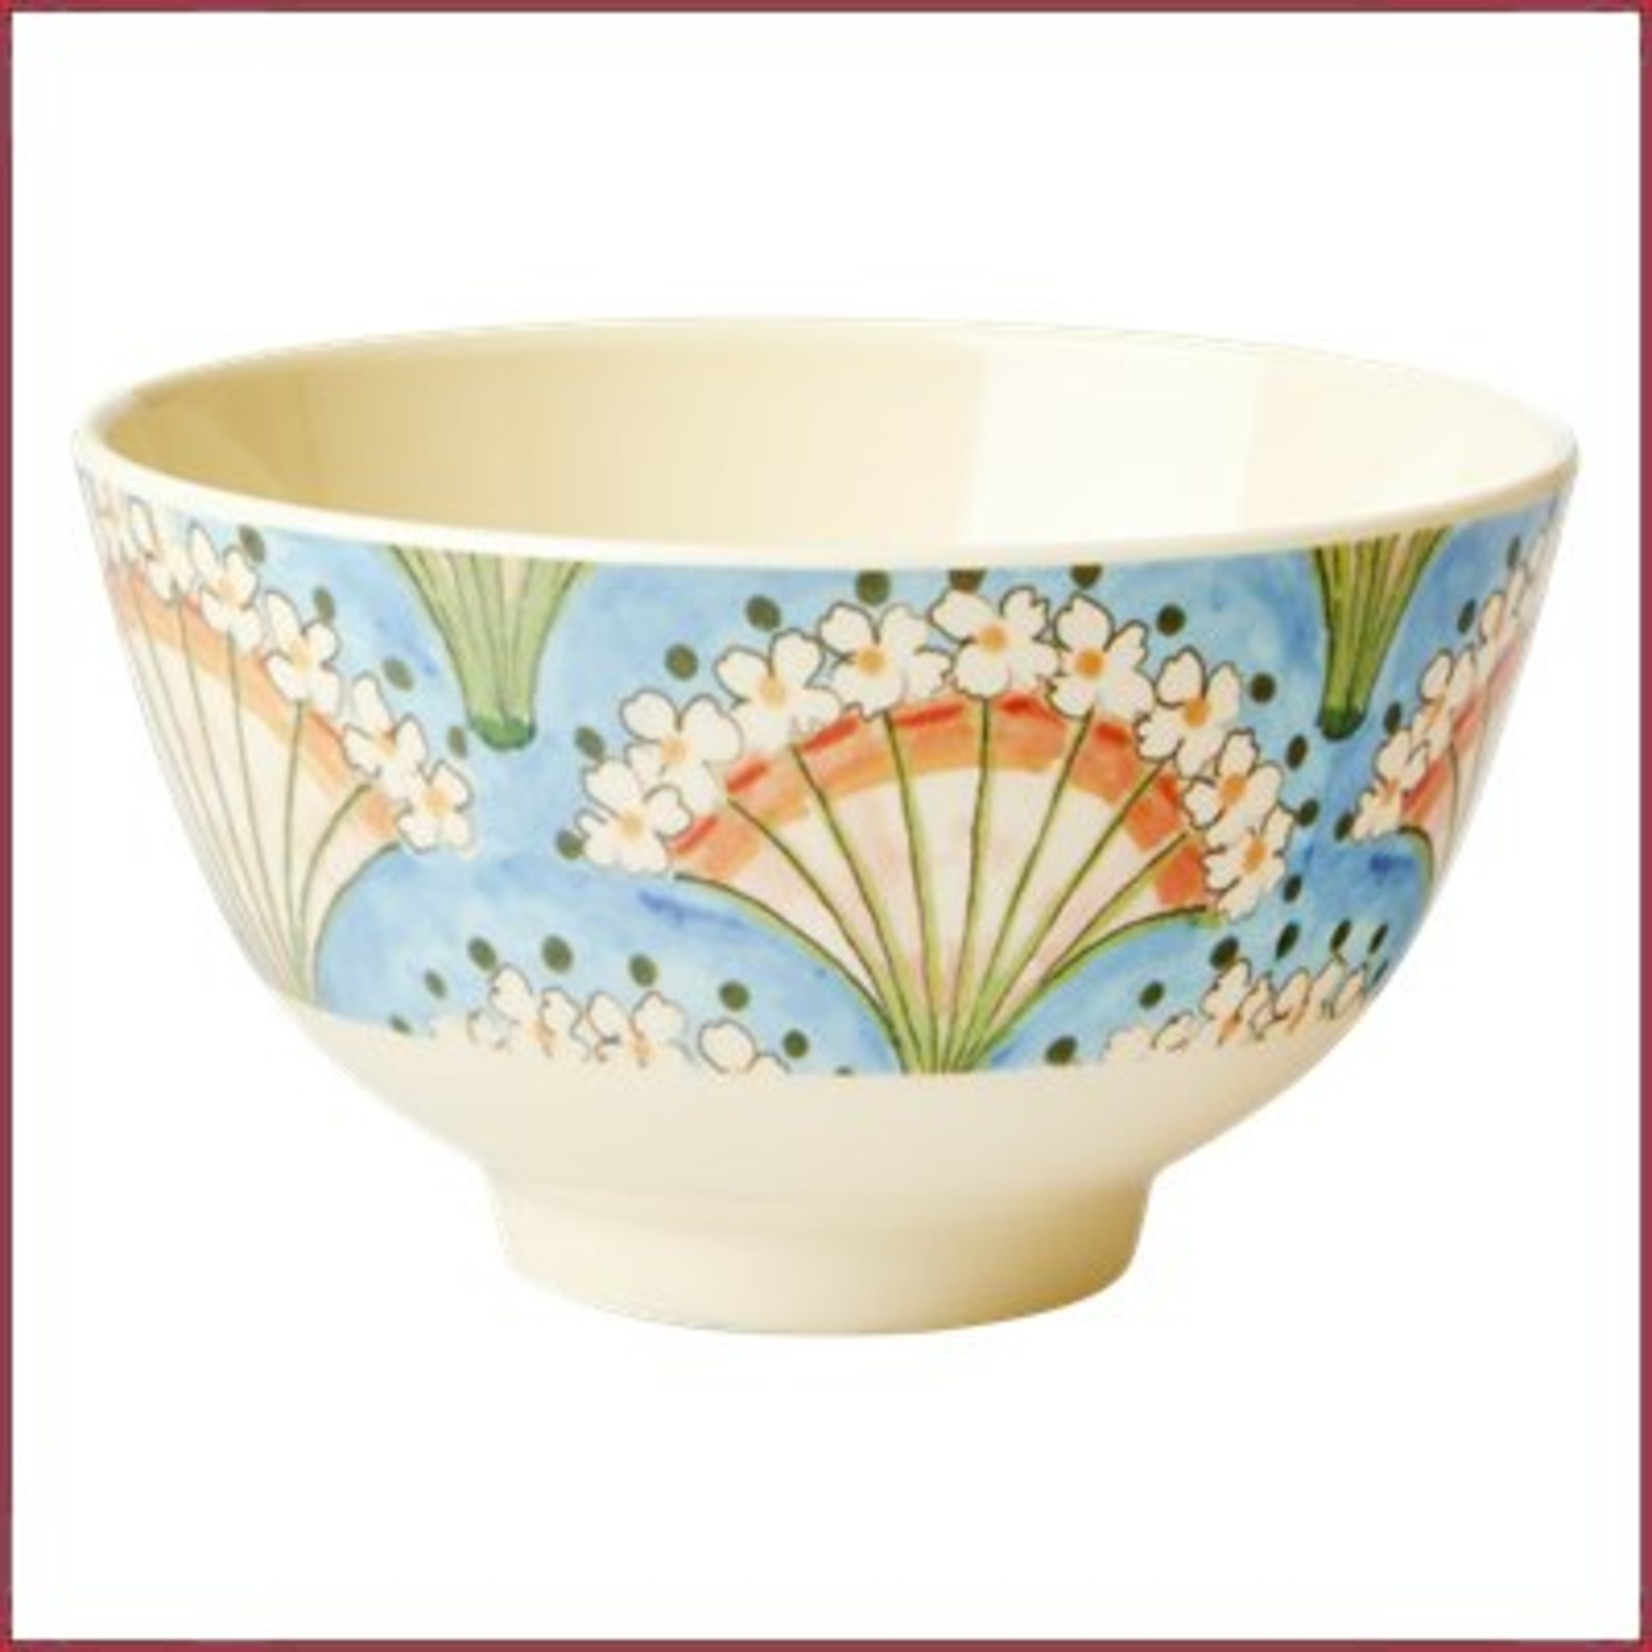 Rice Rice Bowl Small met Flower Fan Print